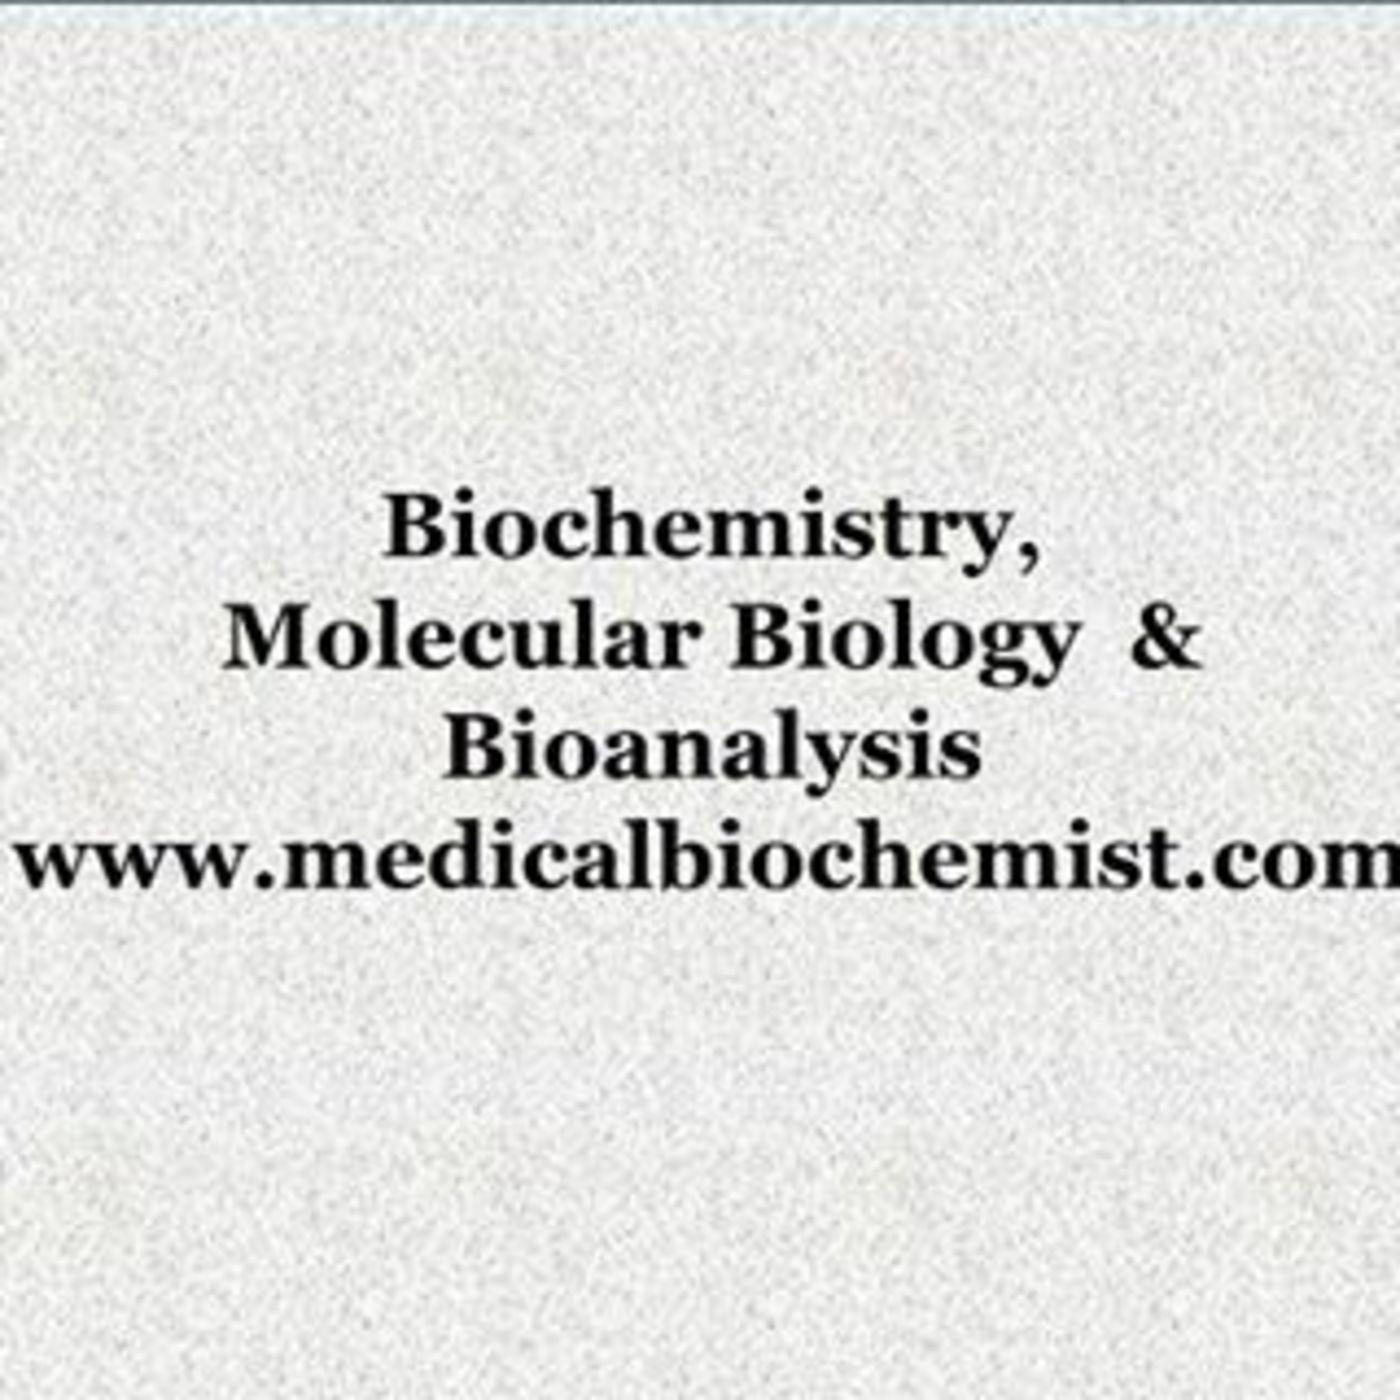 Education Website for Medical and Undergrad Students for Biochemistry, Molecular Biology & Bioanalysis (www.medicalbiochemist.com)